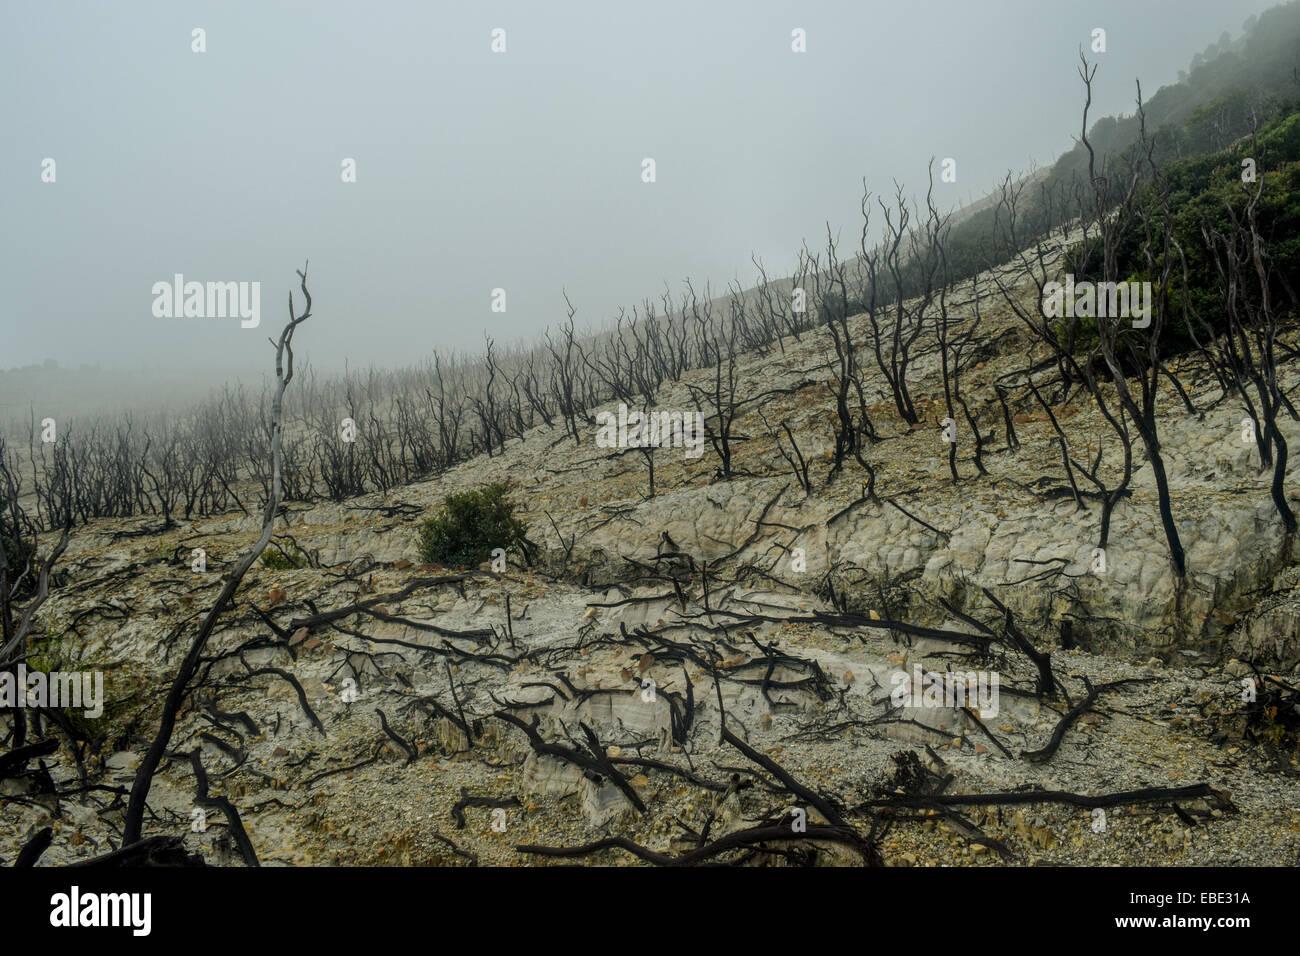 Tote Bäume in der Nähe der Krater des Mount Papandayan, Indonesien. Stockbild